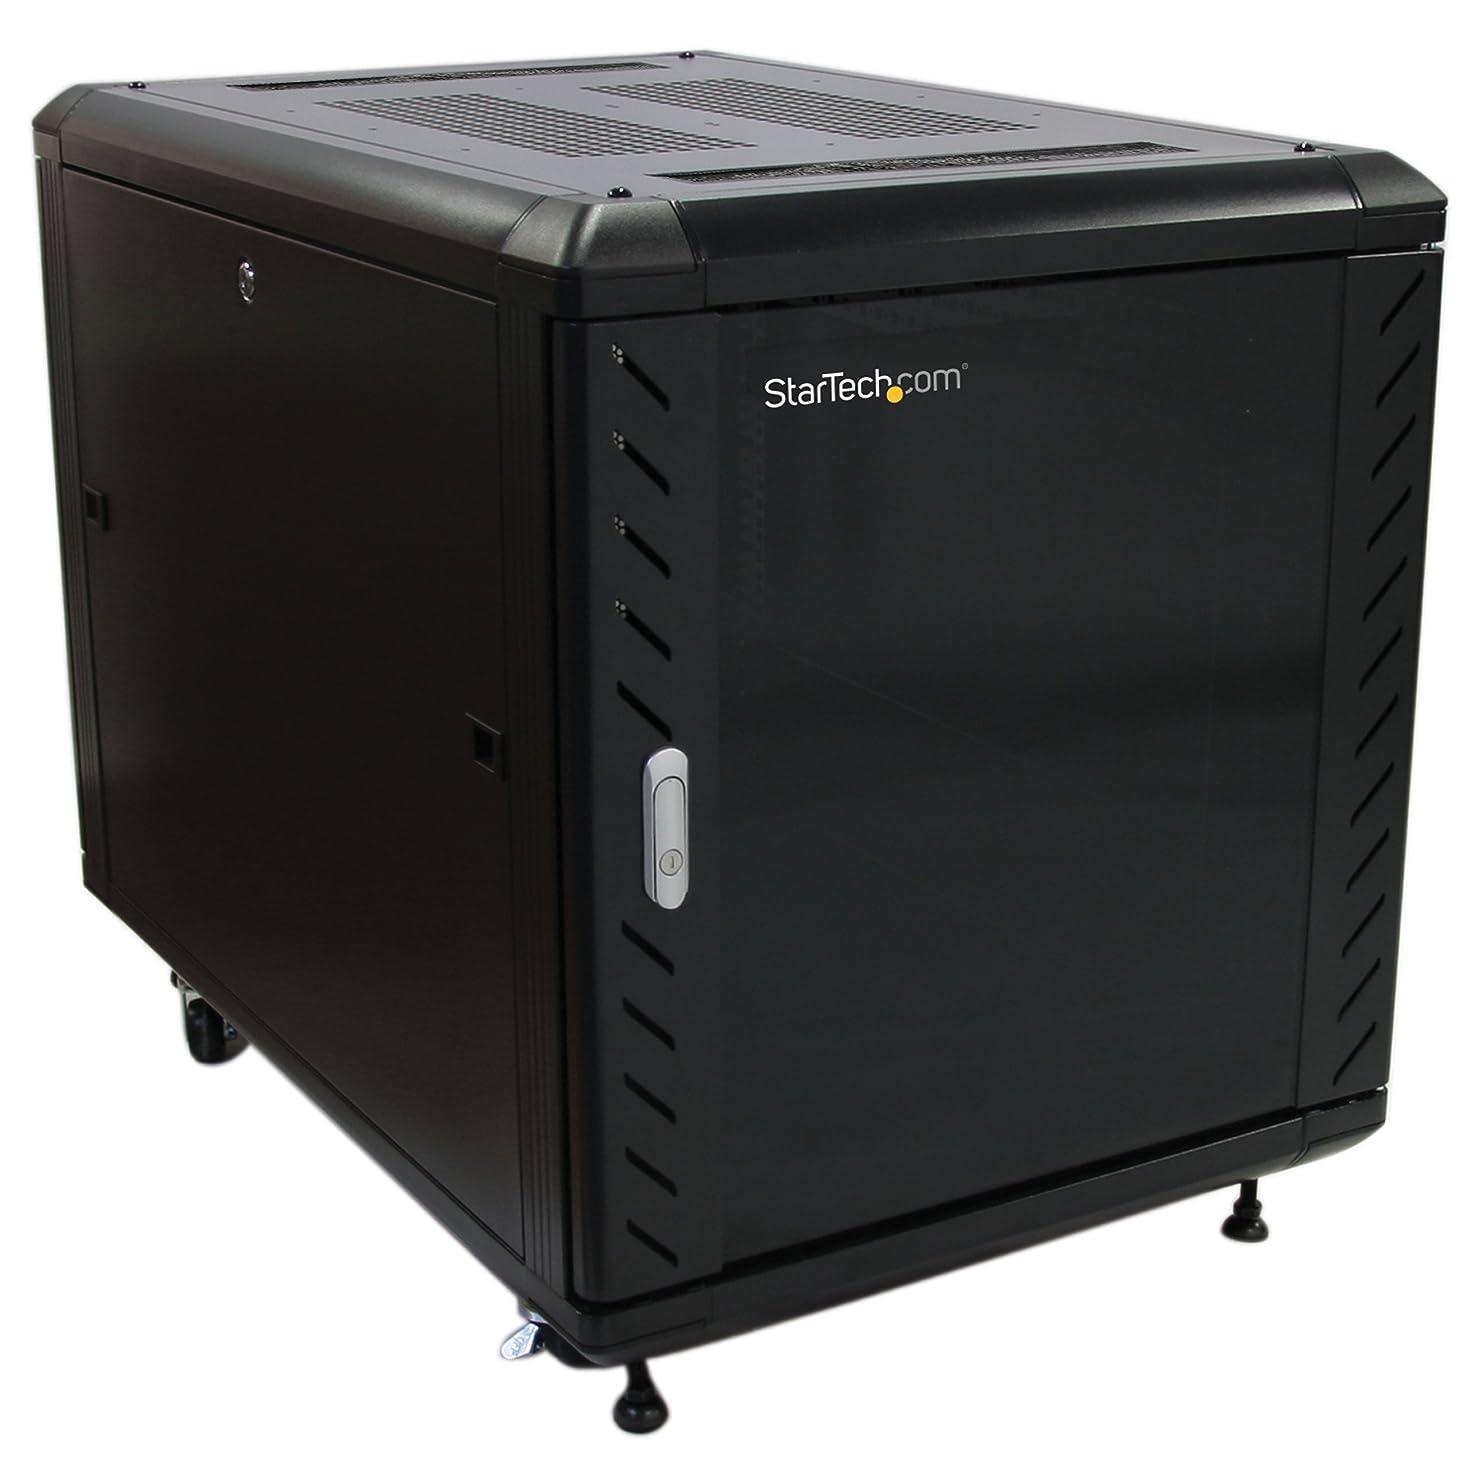 StarTech.com 12U AV Rack Cabinet - Network Rack with Glass Door - 19 inch Computer Cabinet for Server Room or Office (RK1236BKF)